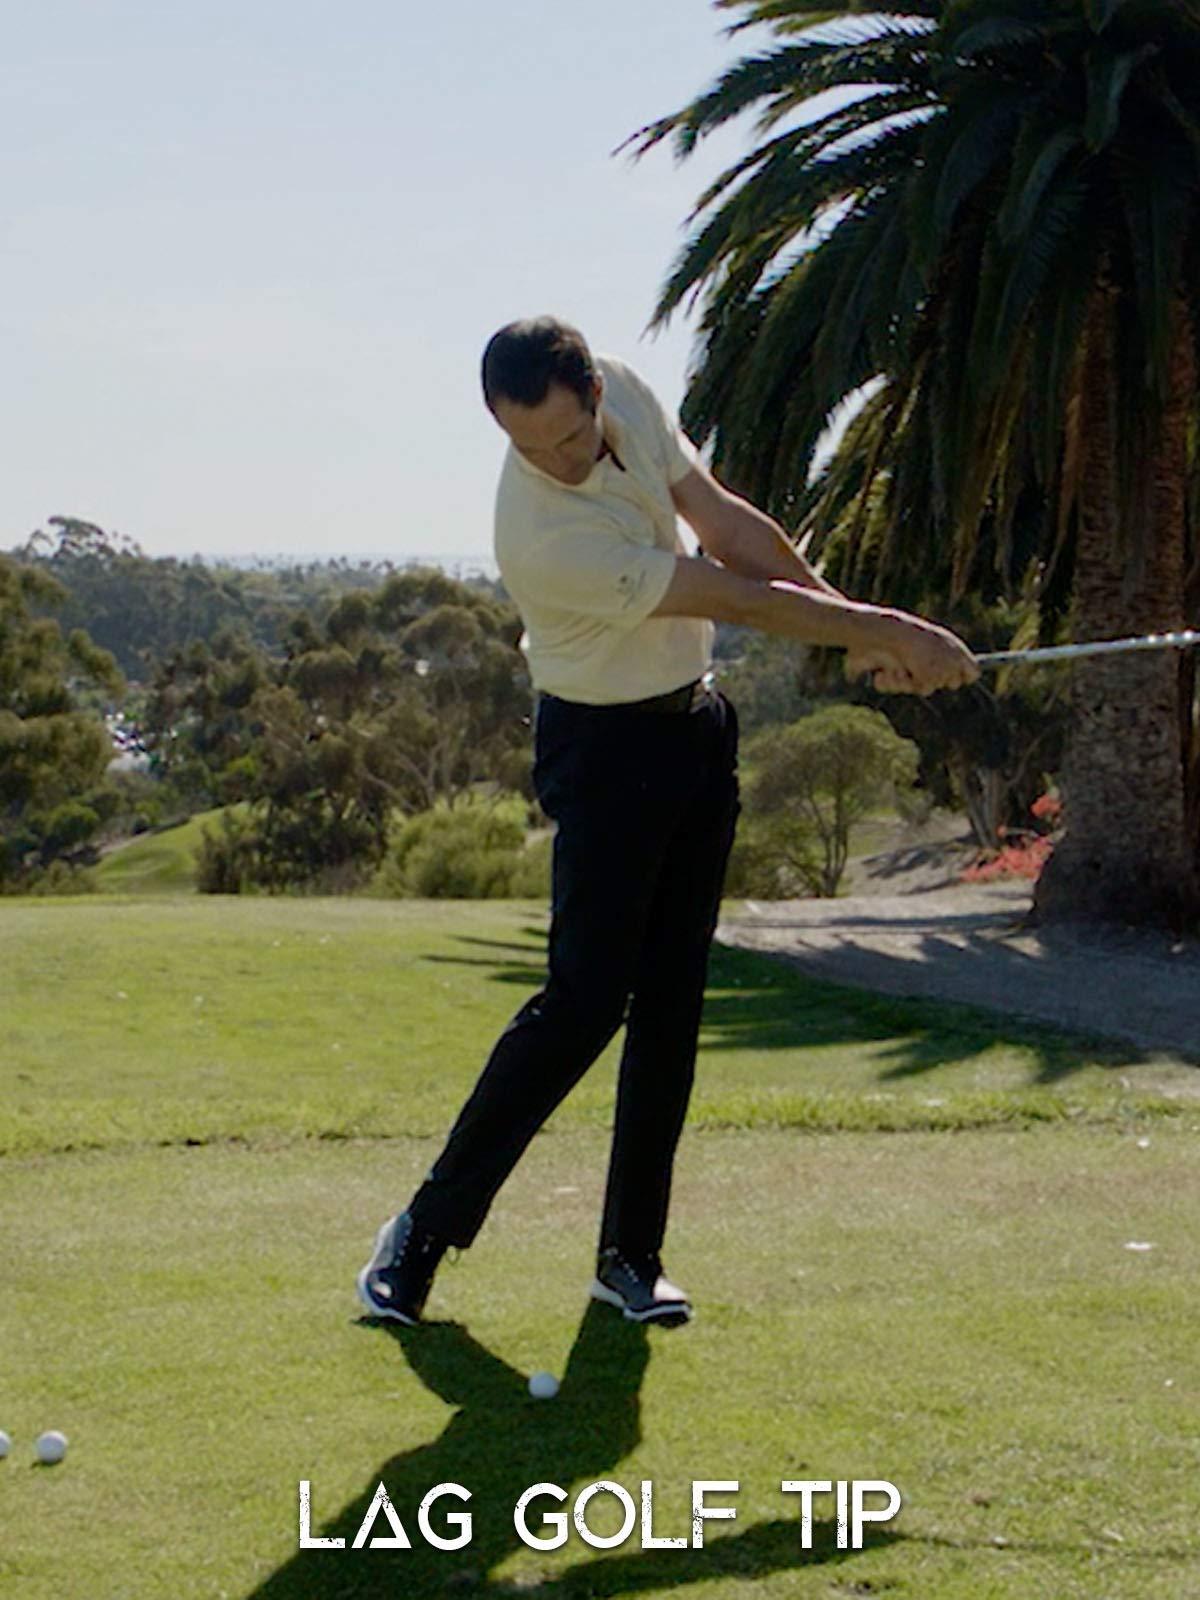 Clip: Lag Golf Tip